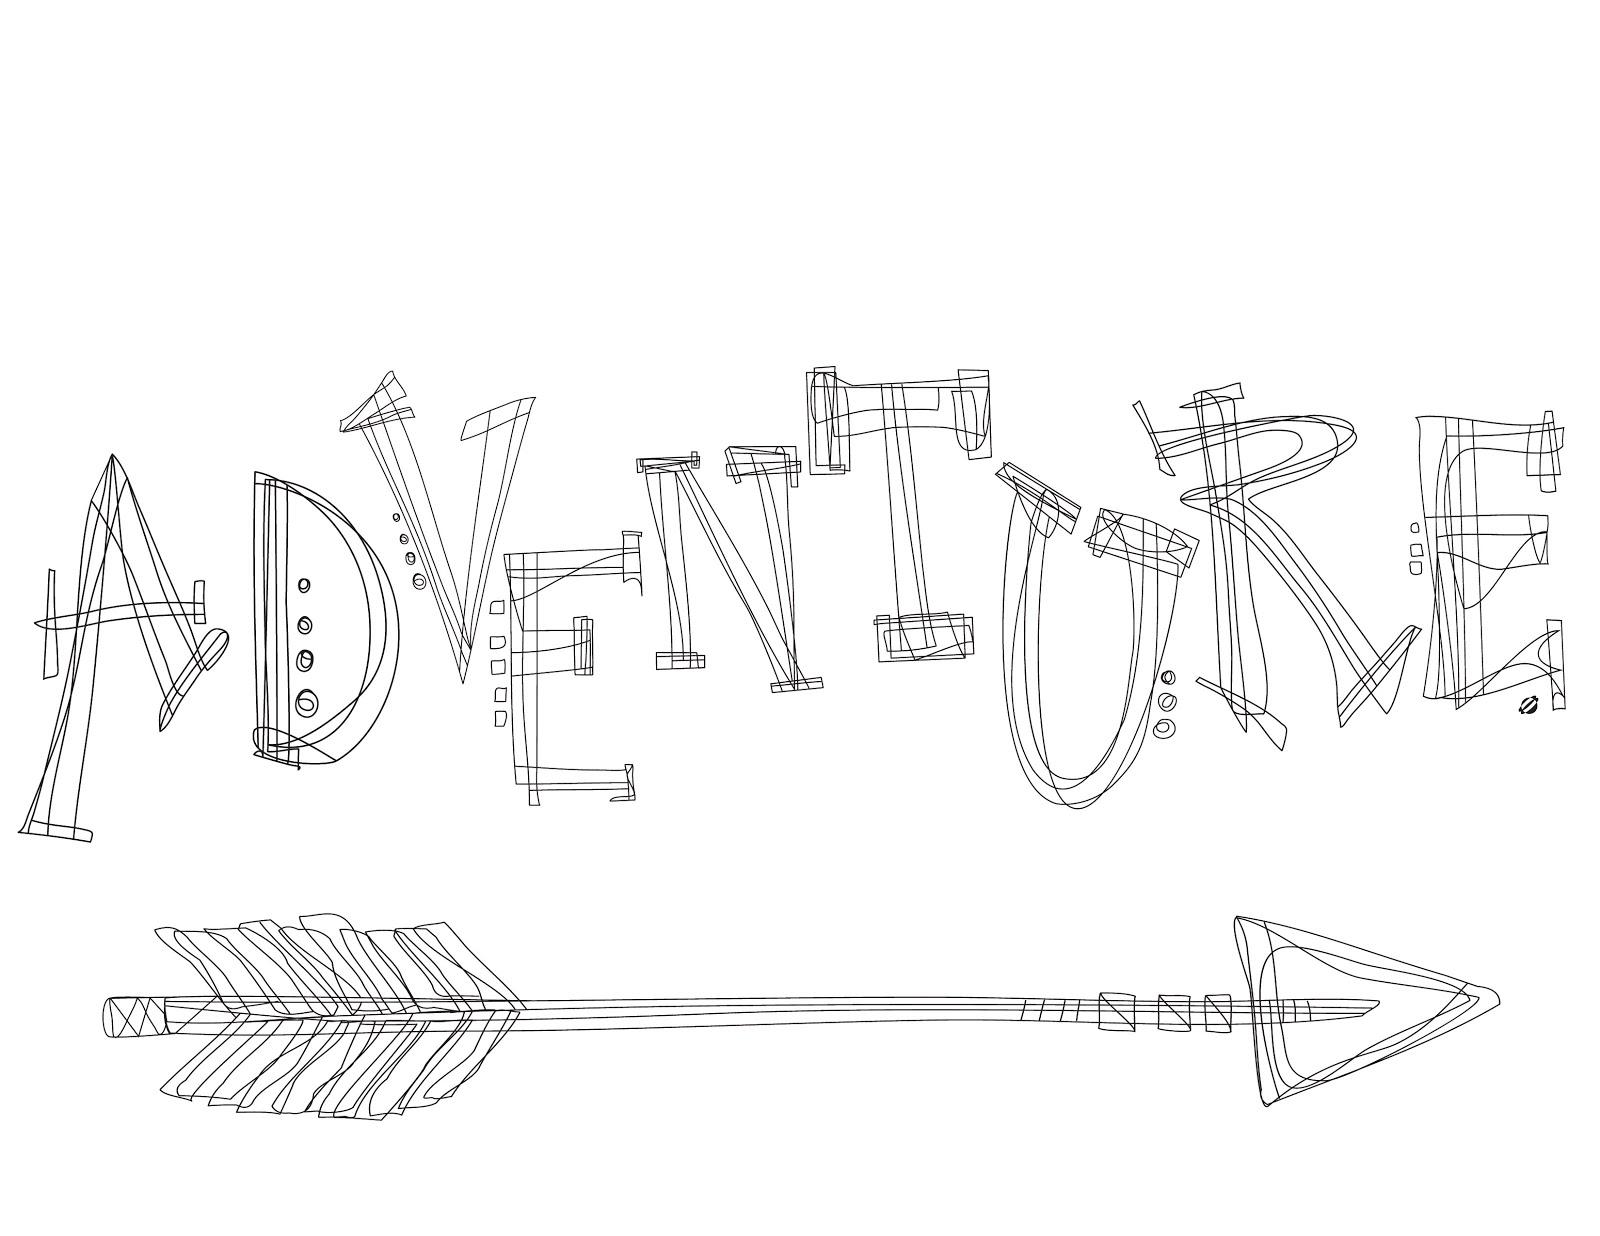 LostBumblebee: Adventure.